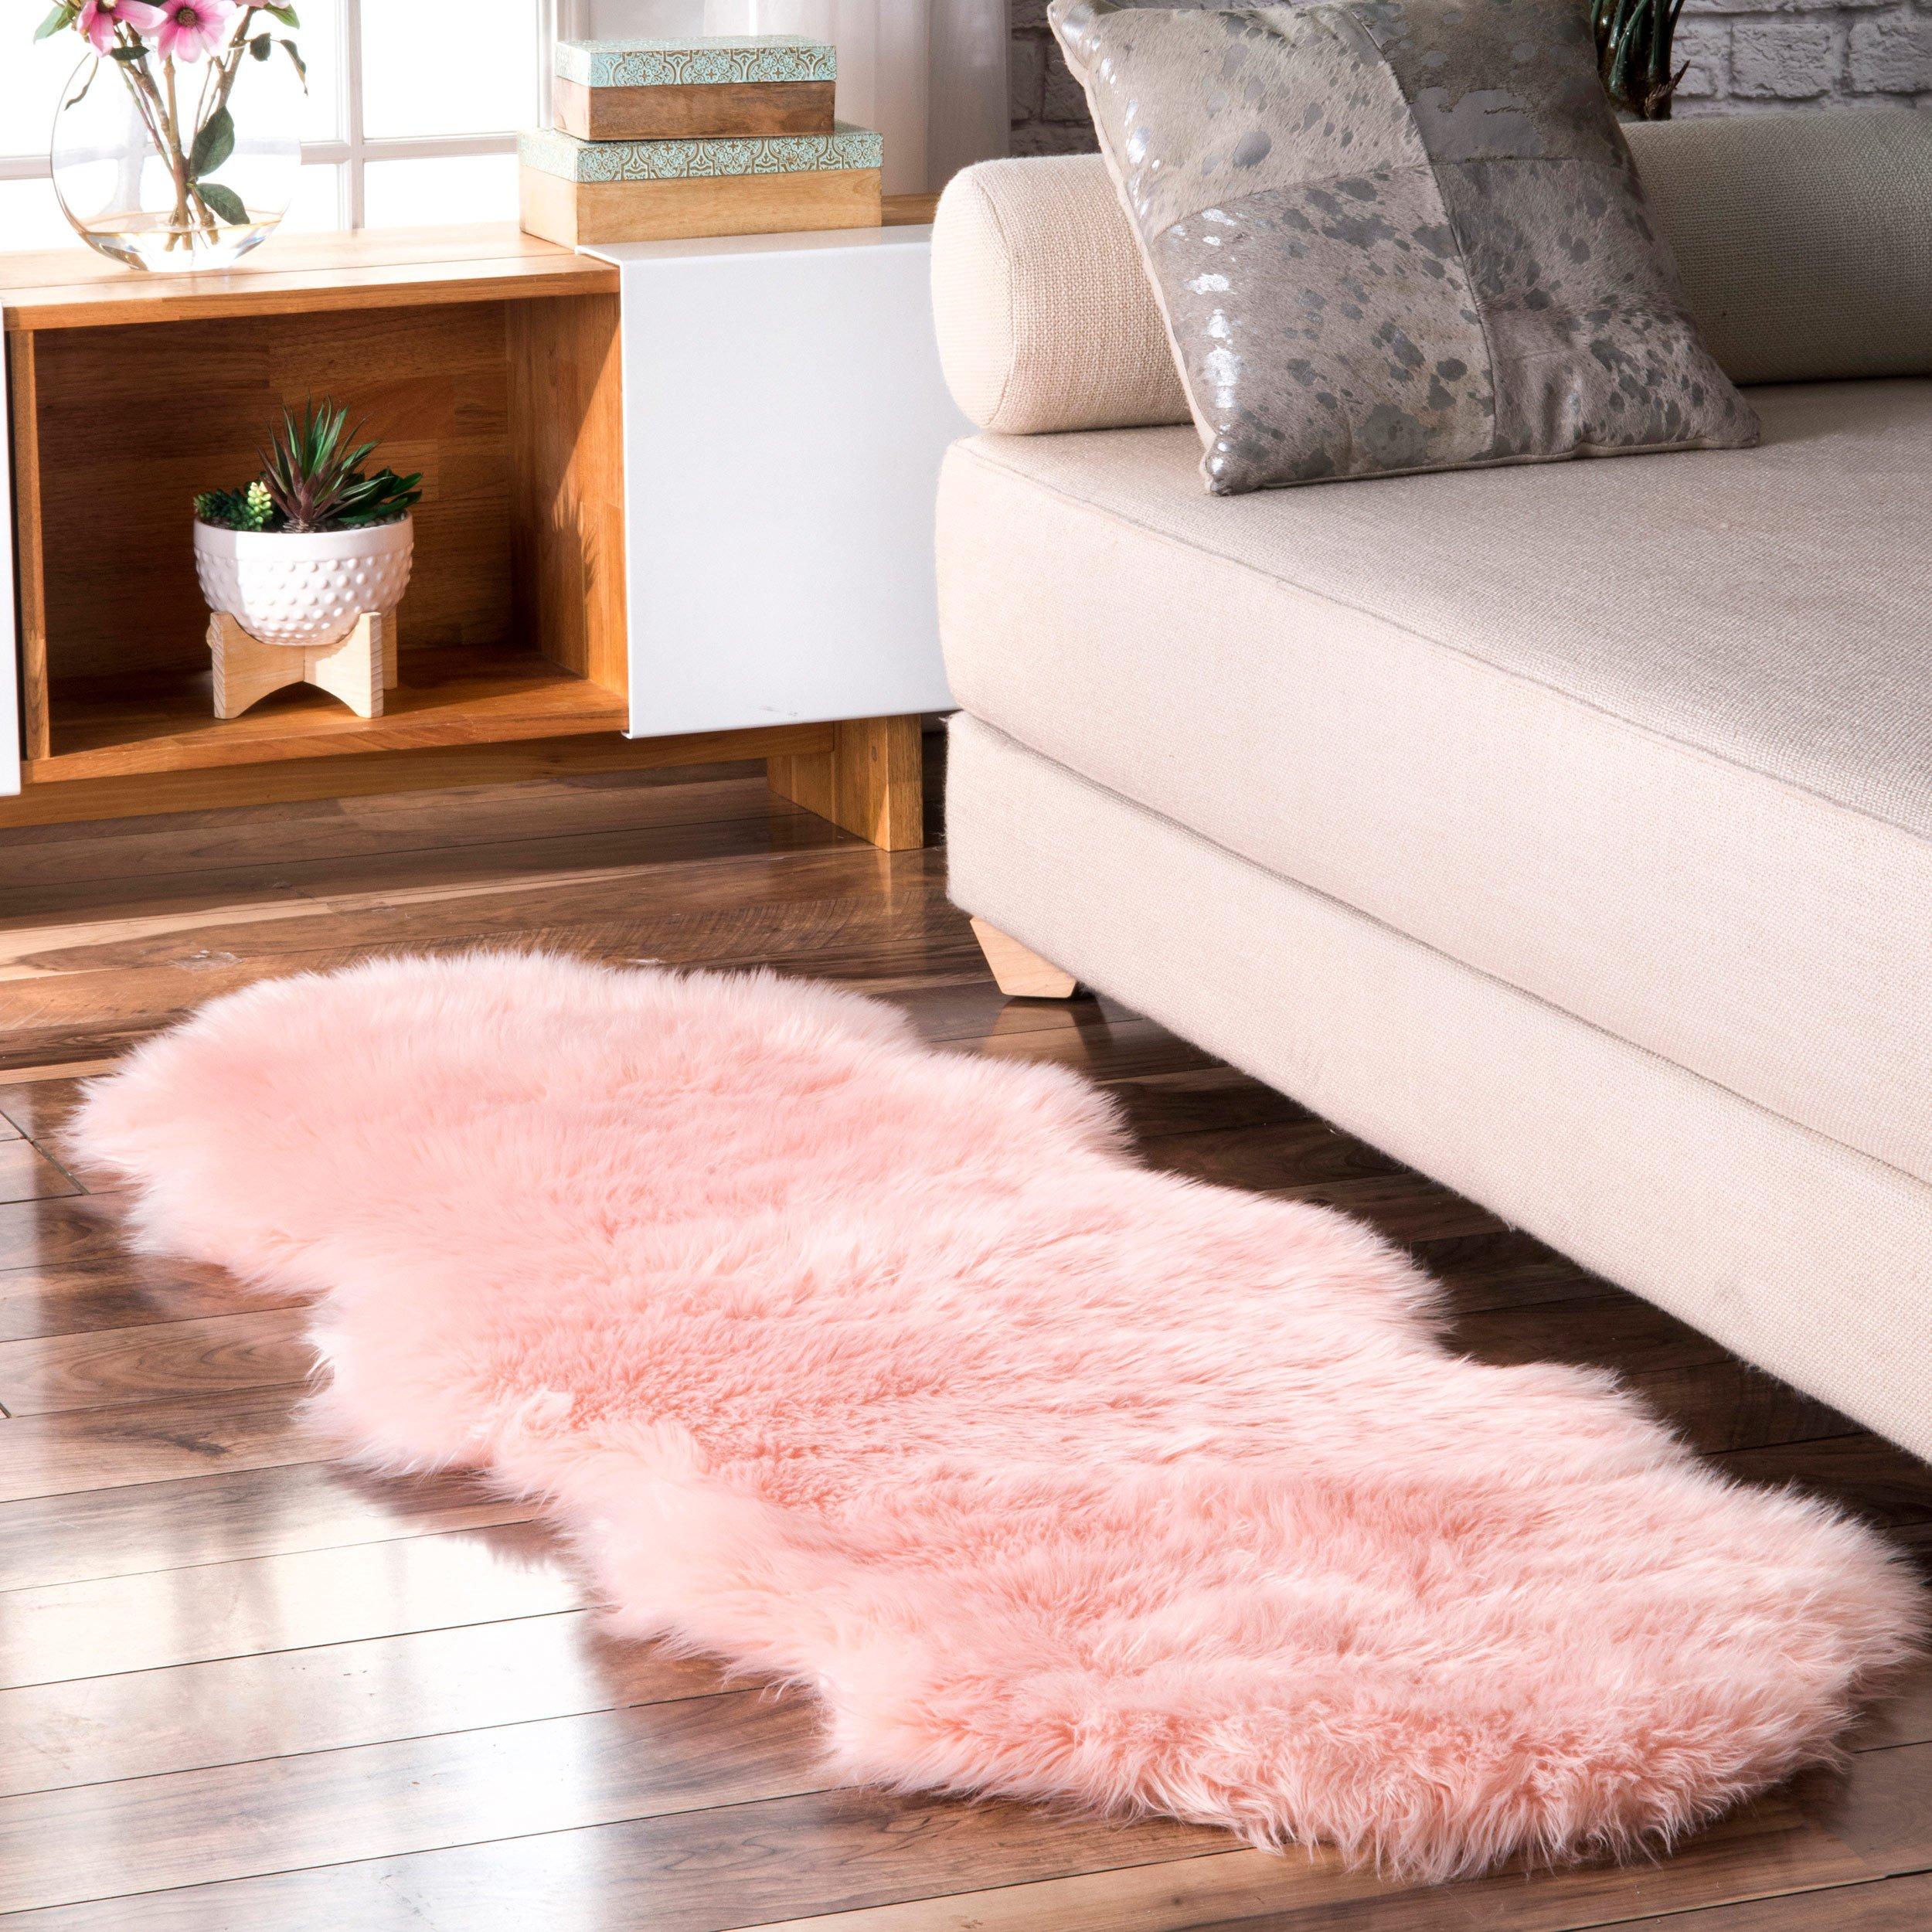 Terrell Solid Faux Sheepskin Bedroom Decor Area Rugs Rugs #sheepskin #rug #living #room